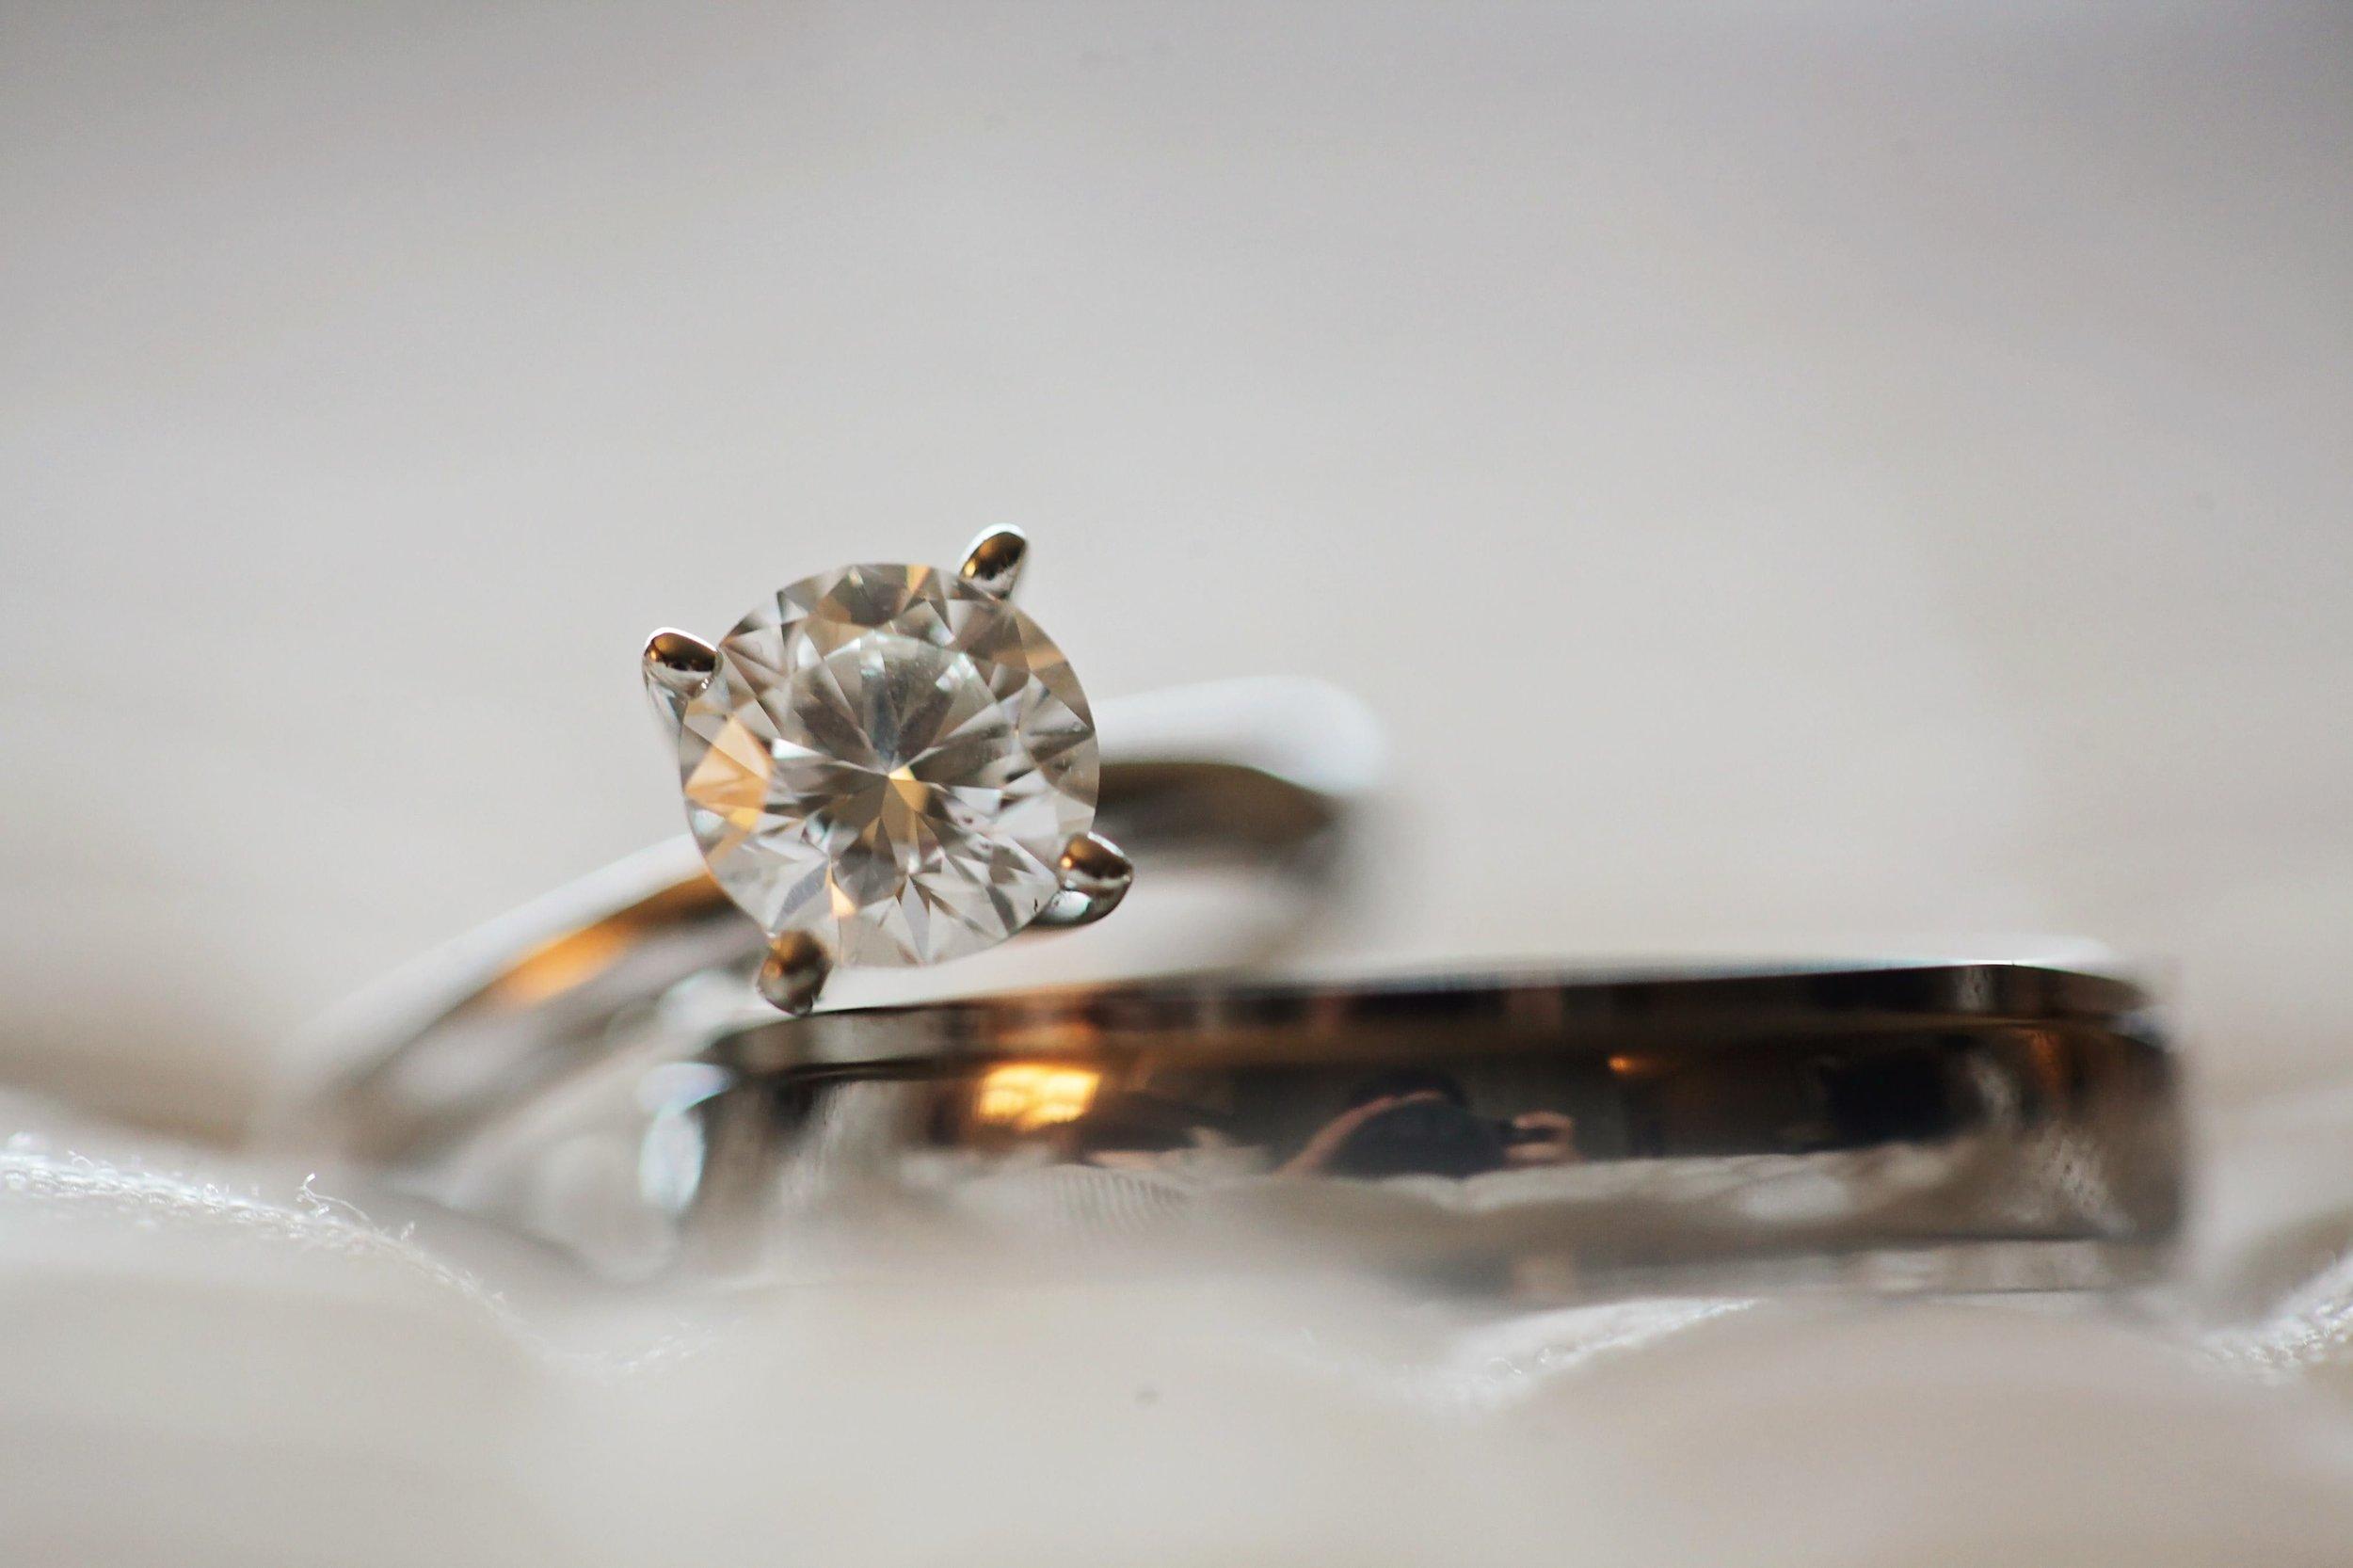 blur-close-up-crystal-691046.jpg